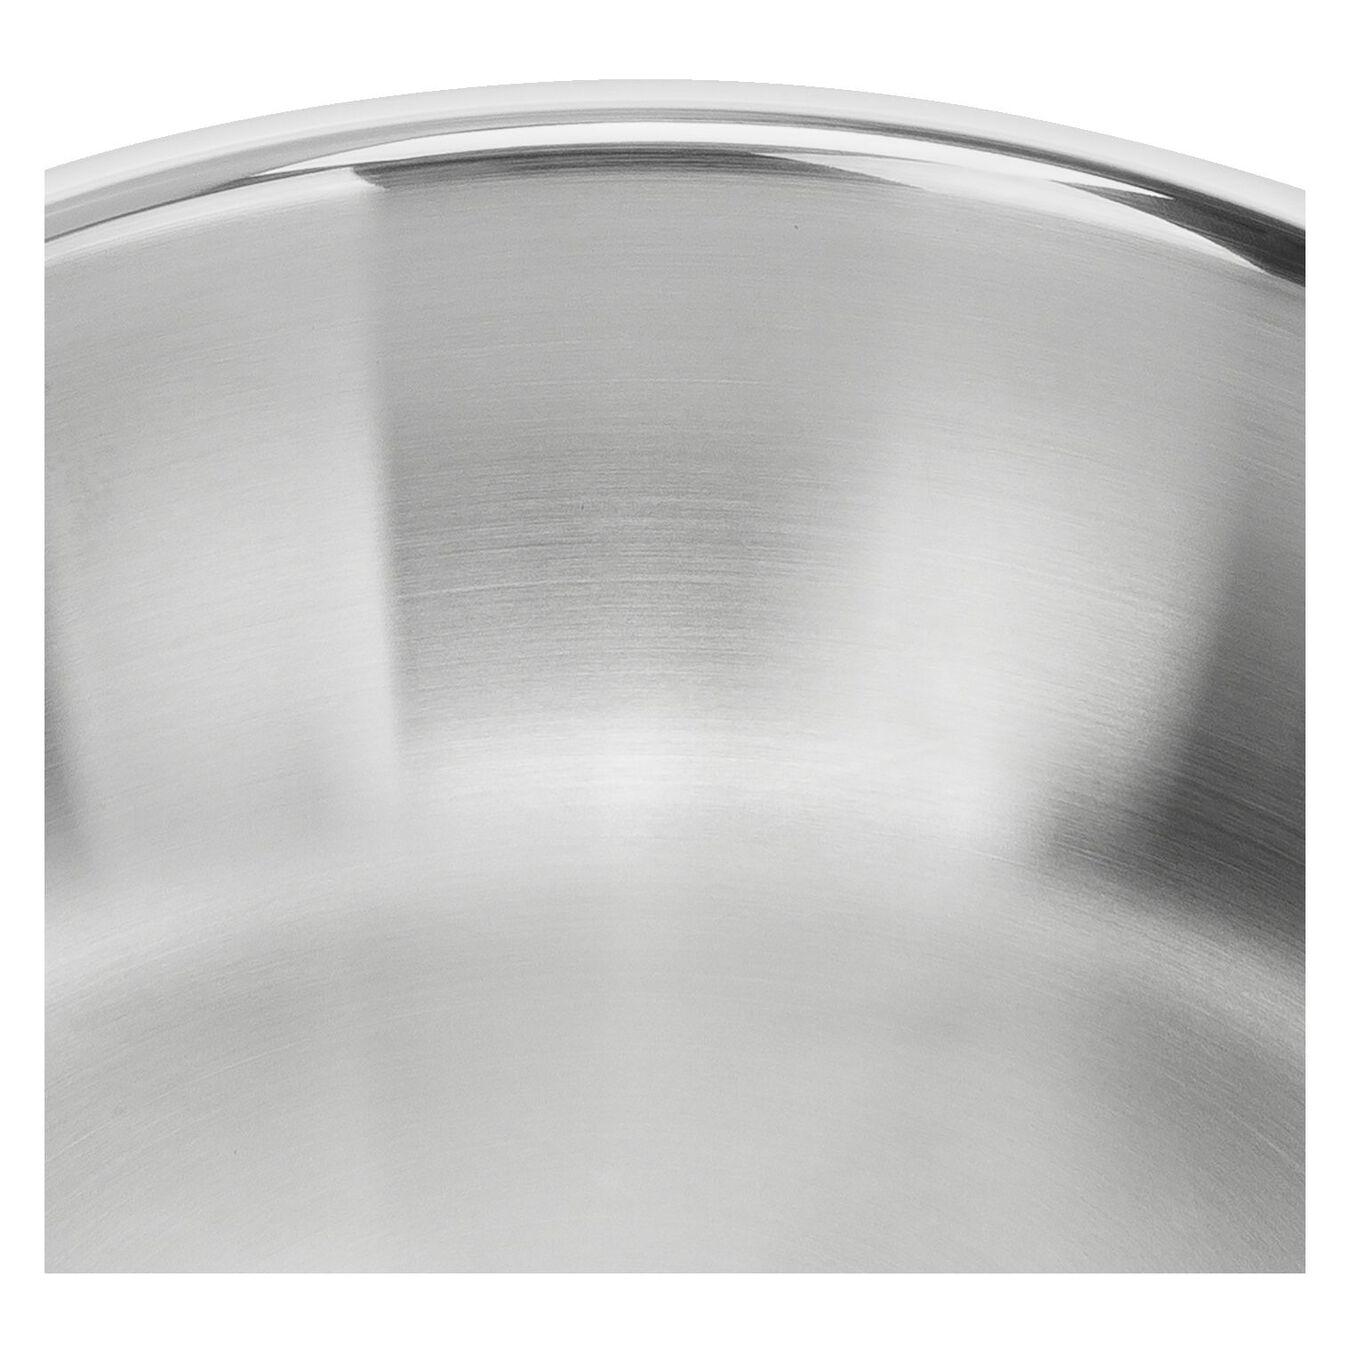 Bratpfanne 24 cm, 18/10 Edelstahl, Silber,,large 4